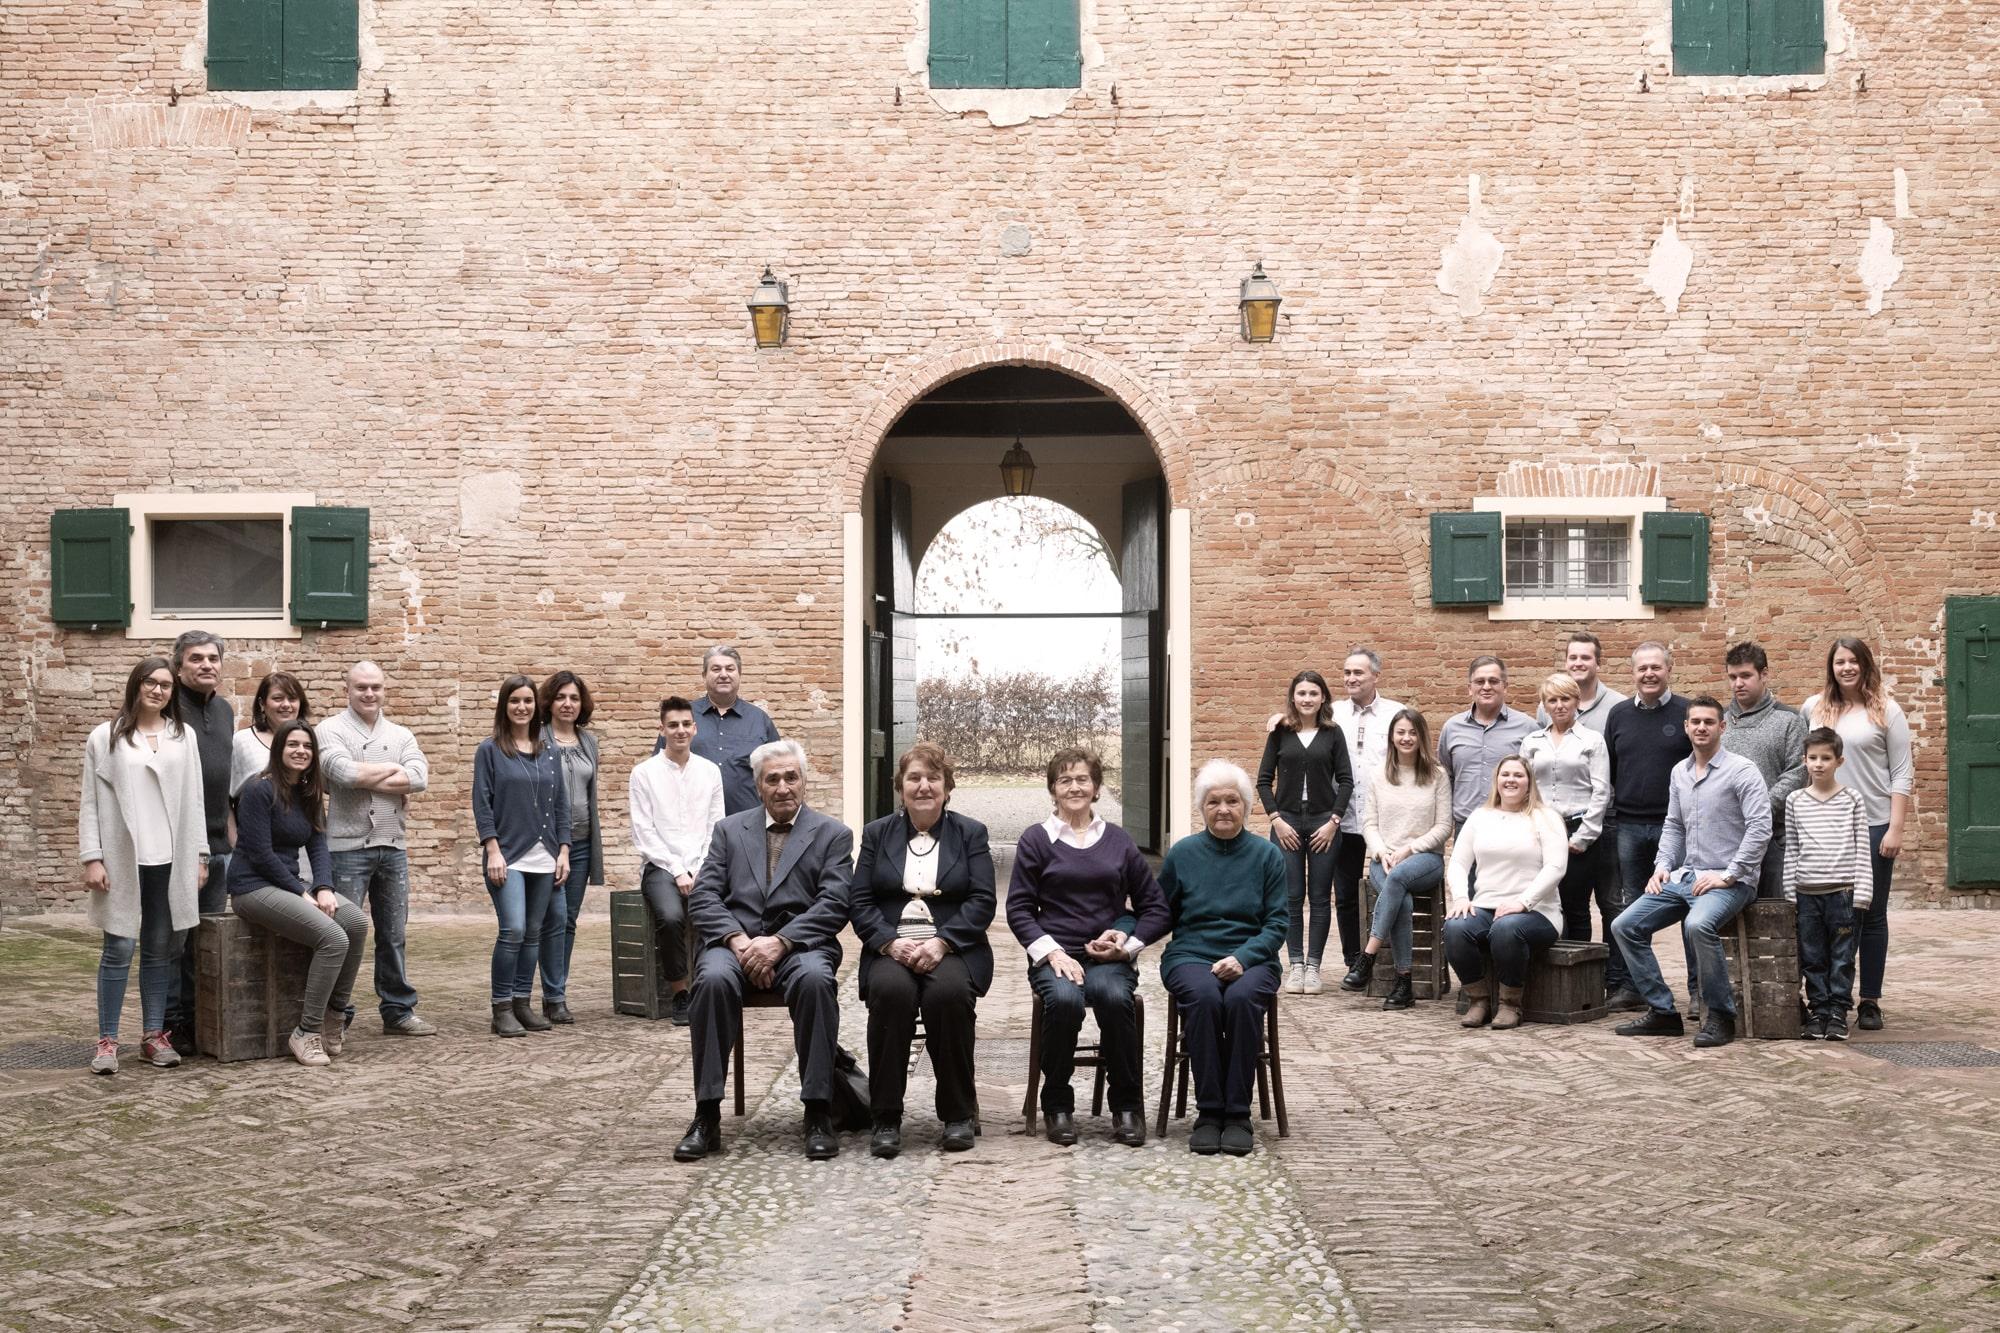 Image https://shop.parmigianoreggiano.com/media/contentmanager/content/L1080181_colori_seppia-min.jpeg